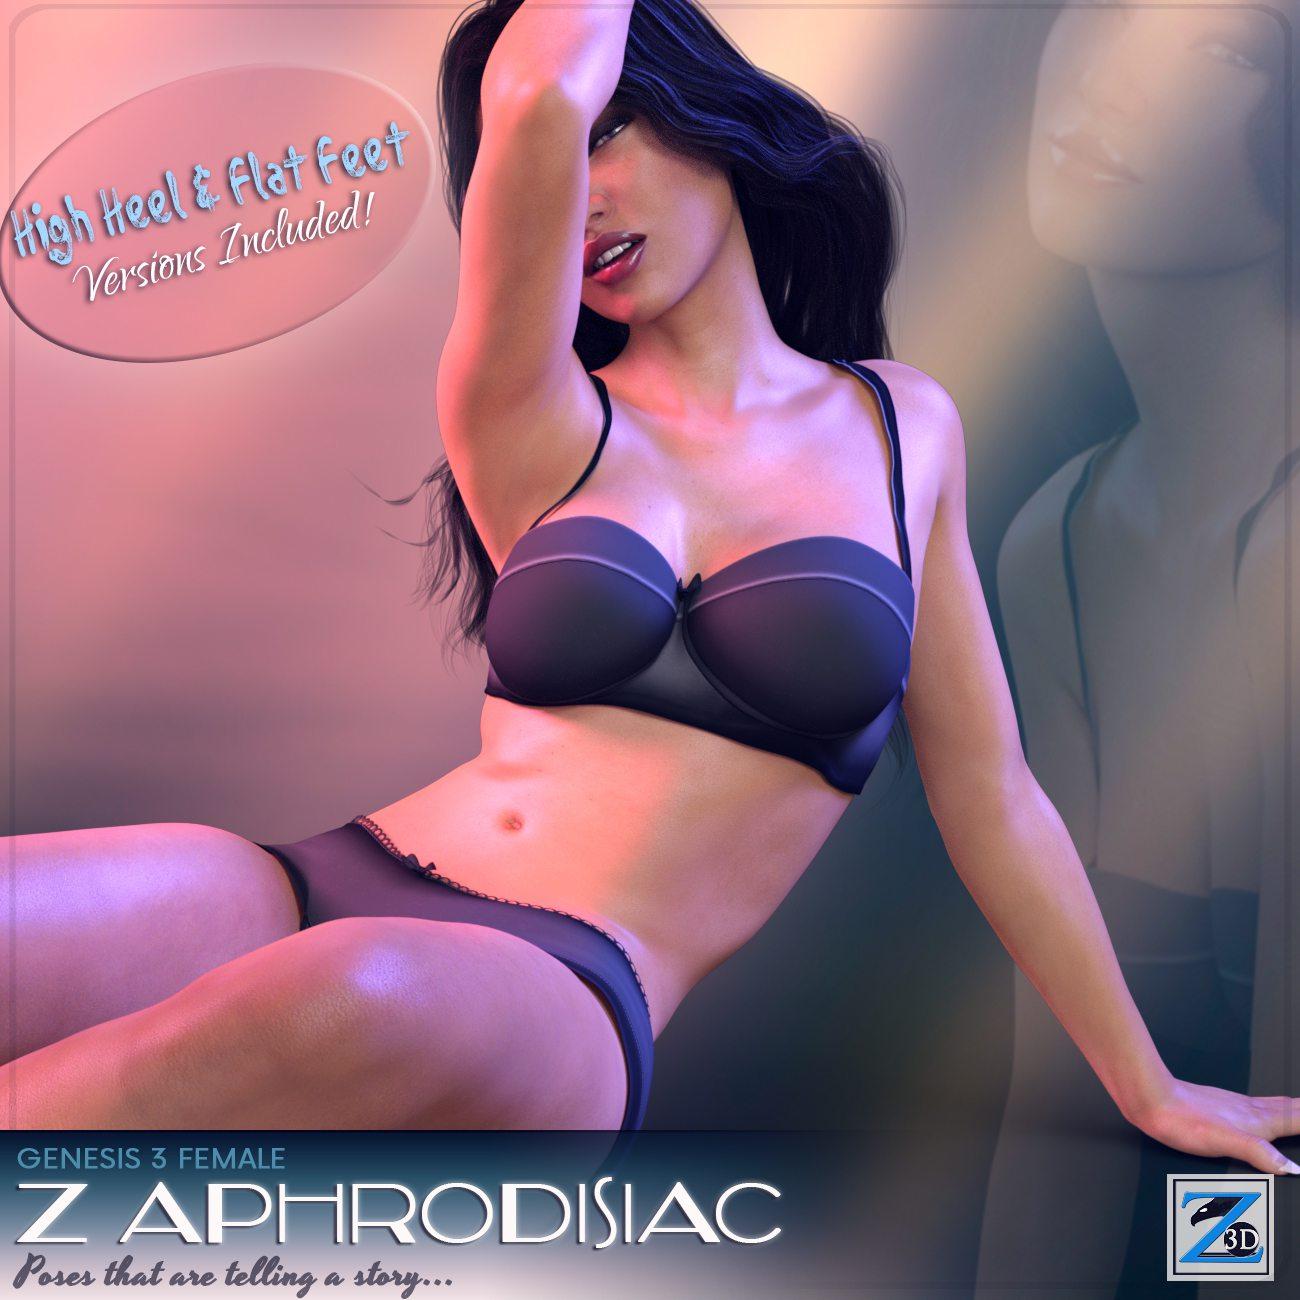 Z Aphrodisiac – Poses for Genesis 3 Female_DAZ3D下载站